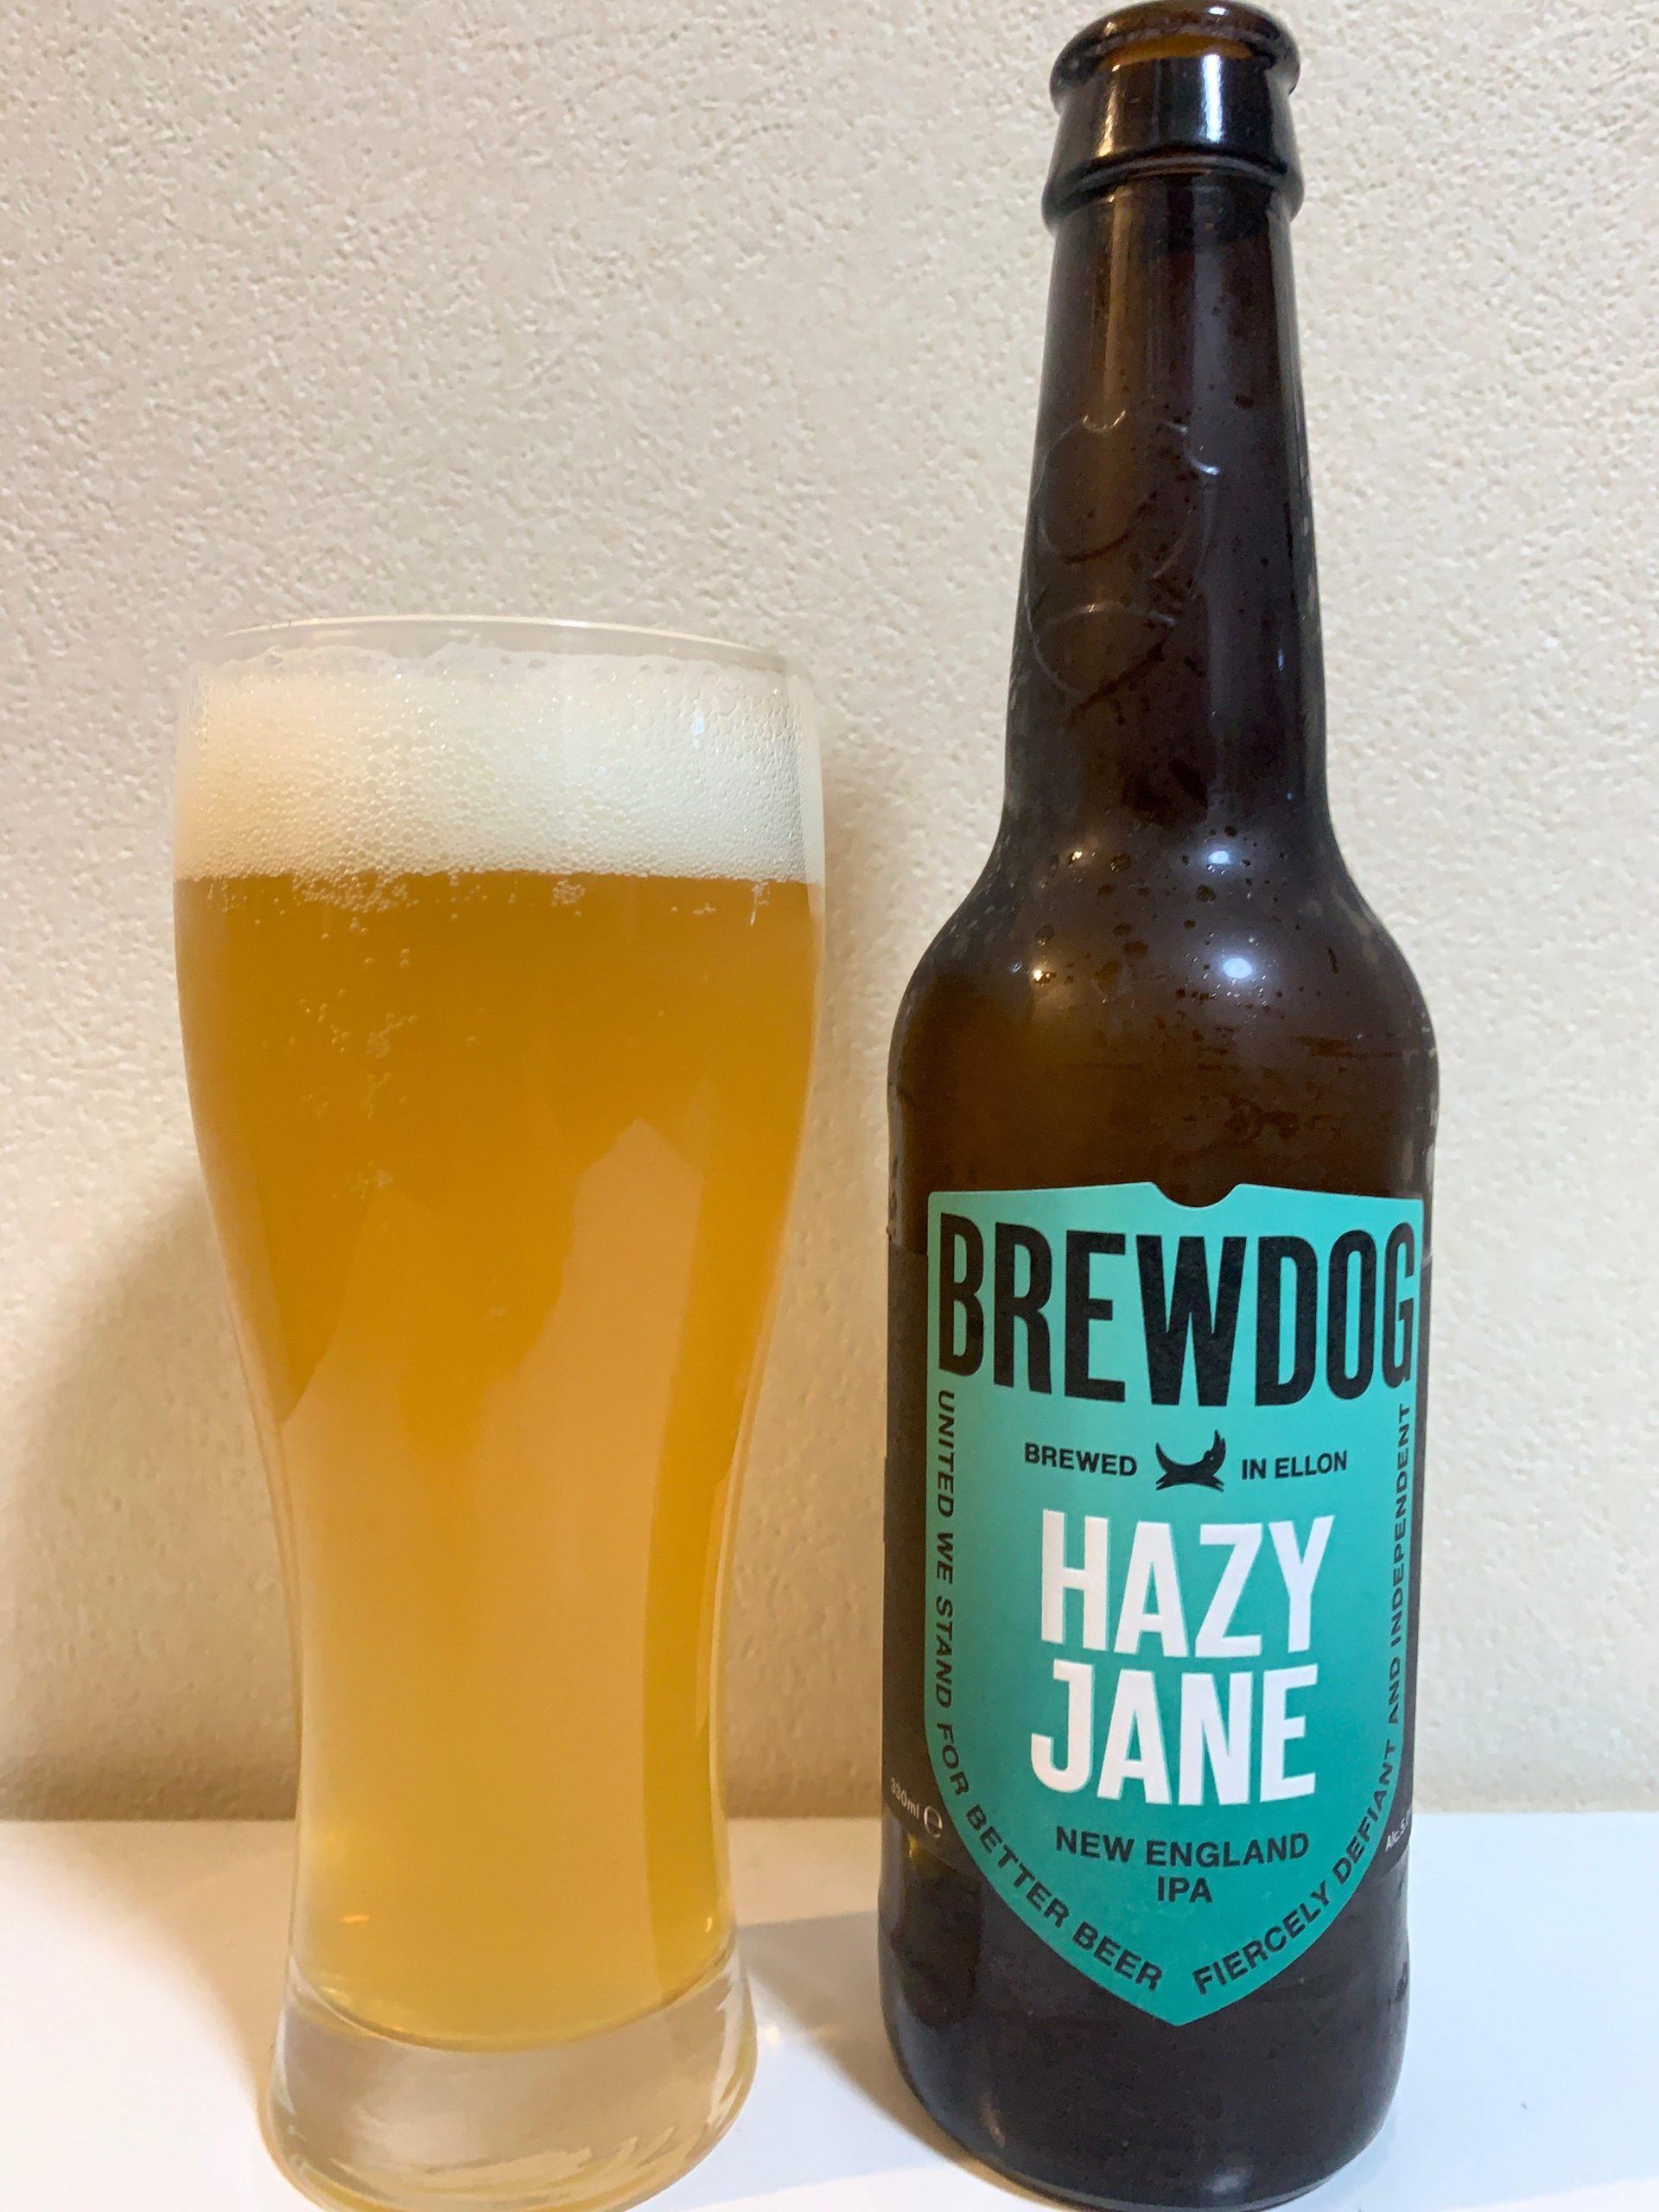 BREWDOG HAZY JANE(ブリュードッグ ヘイジージェーン)